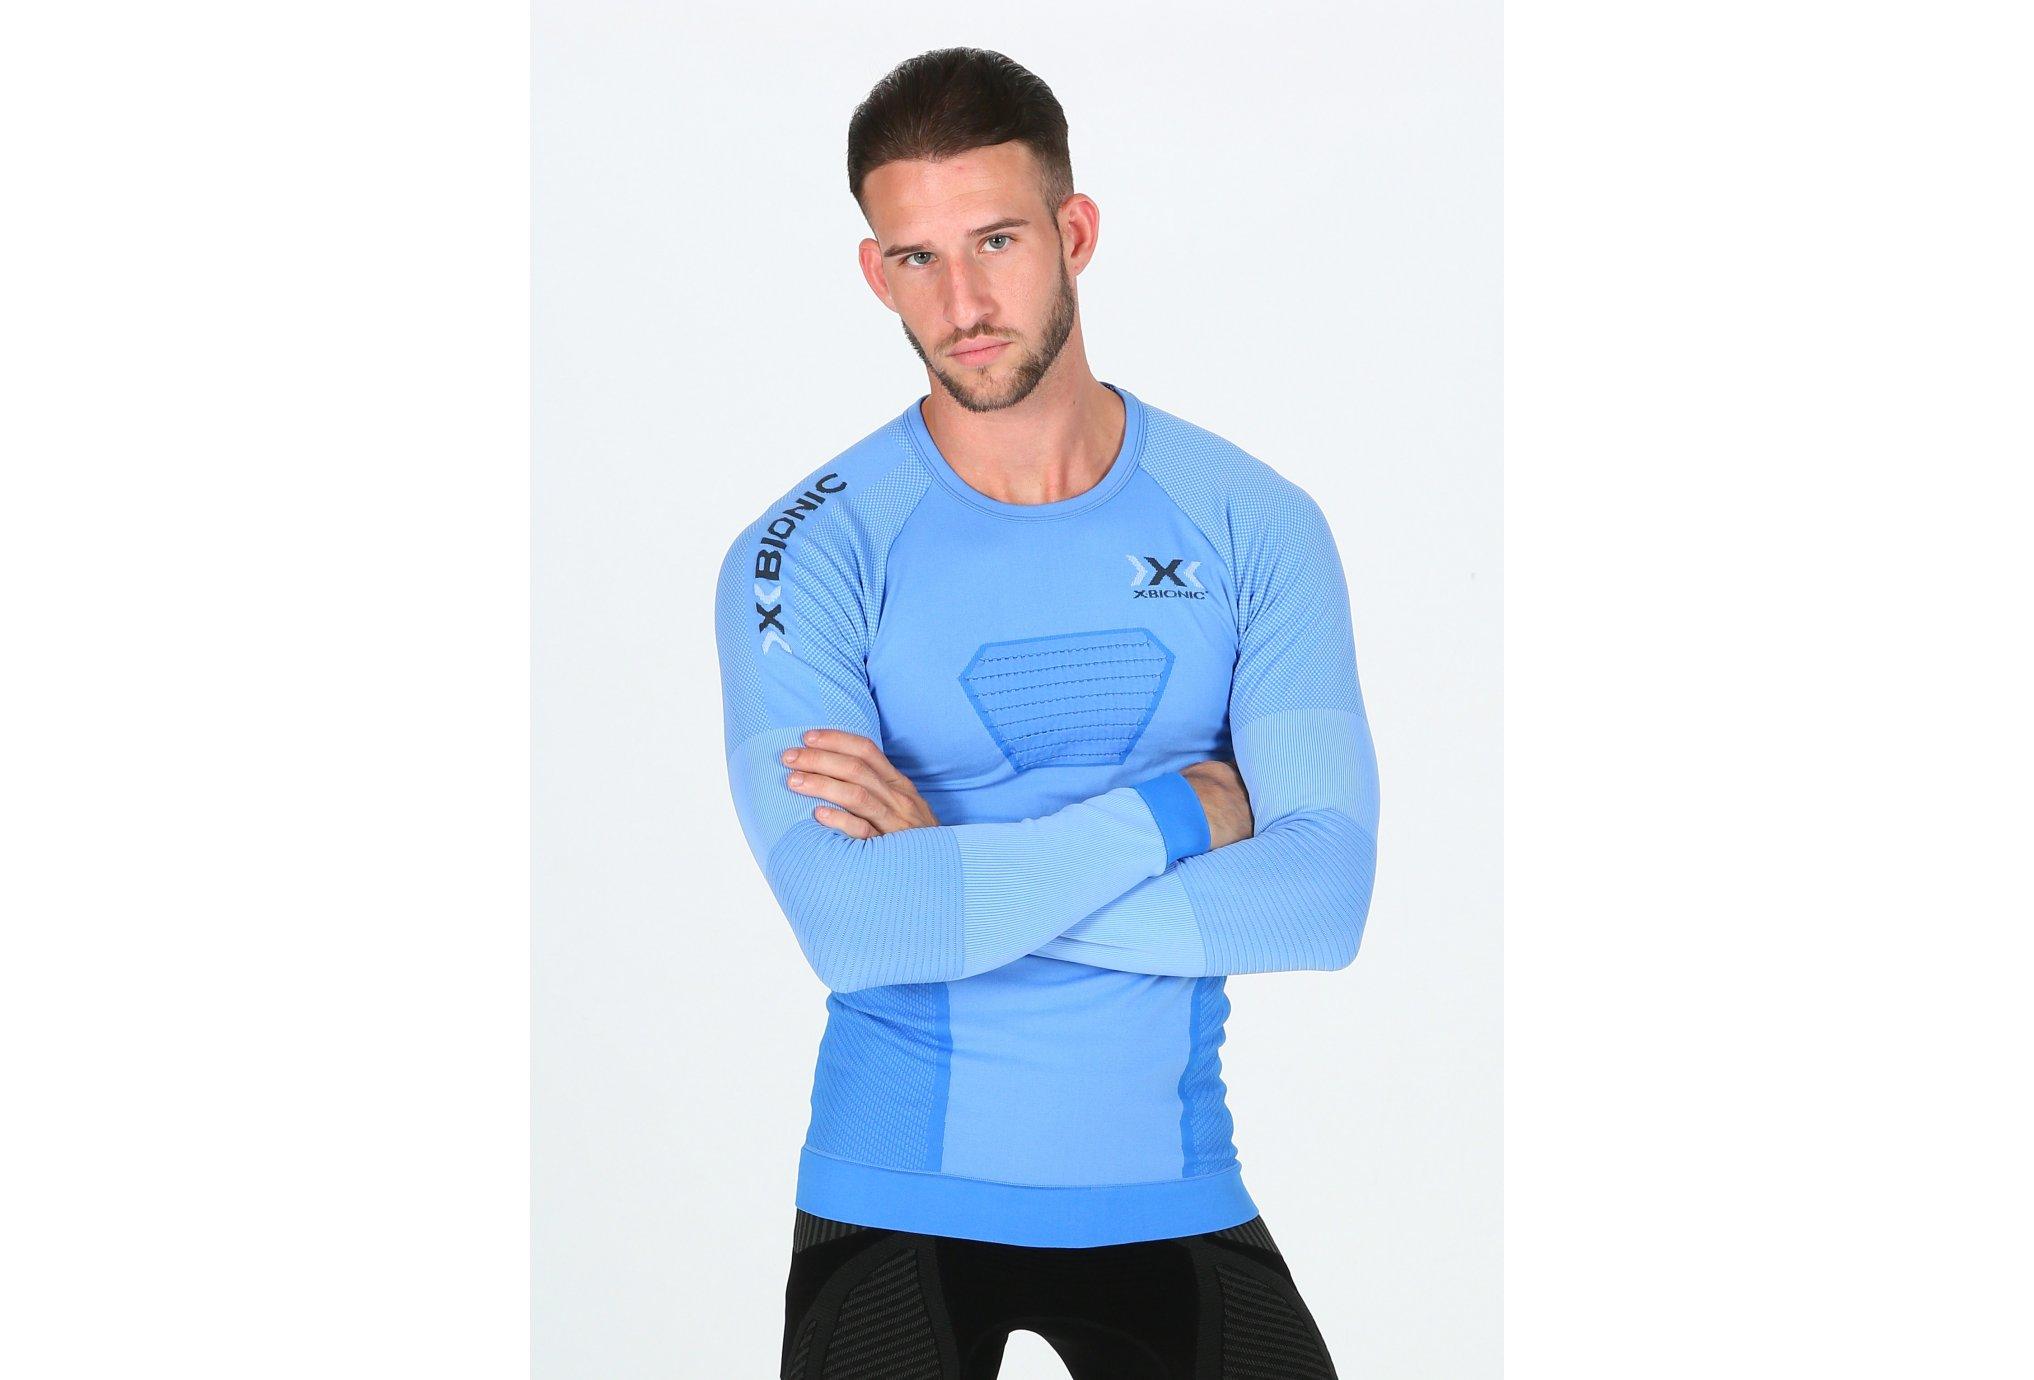 X-Bionic Running Speed Evo M Diététique Vêtements homme